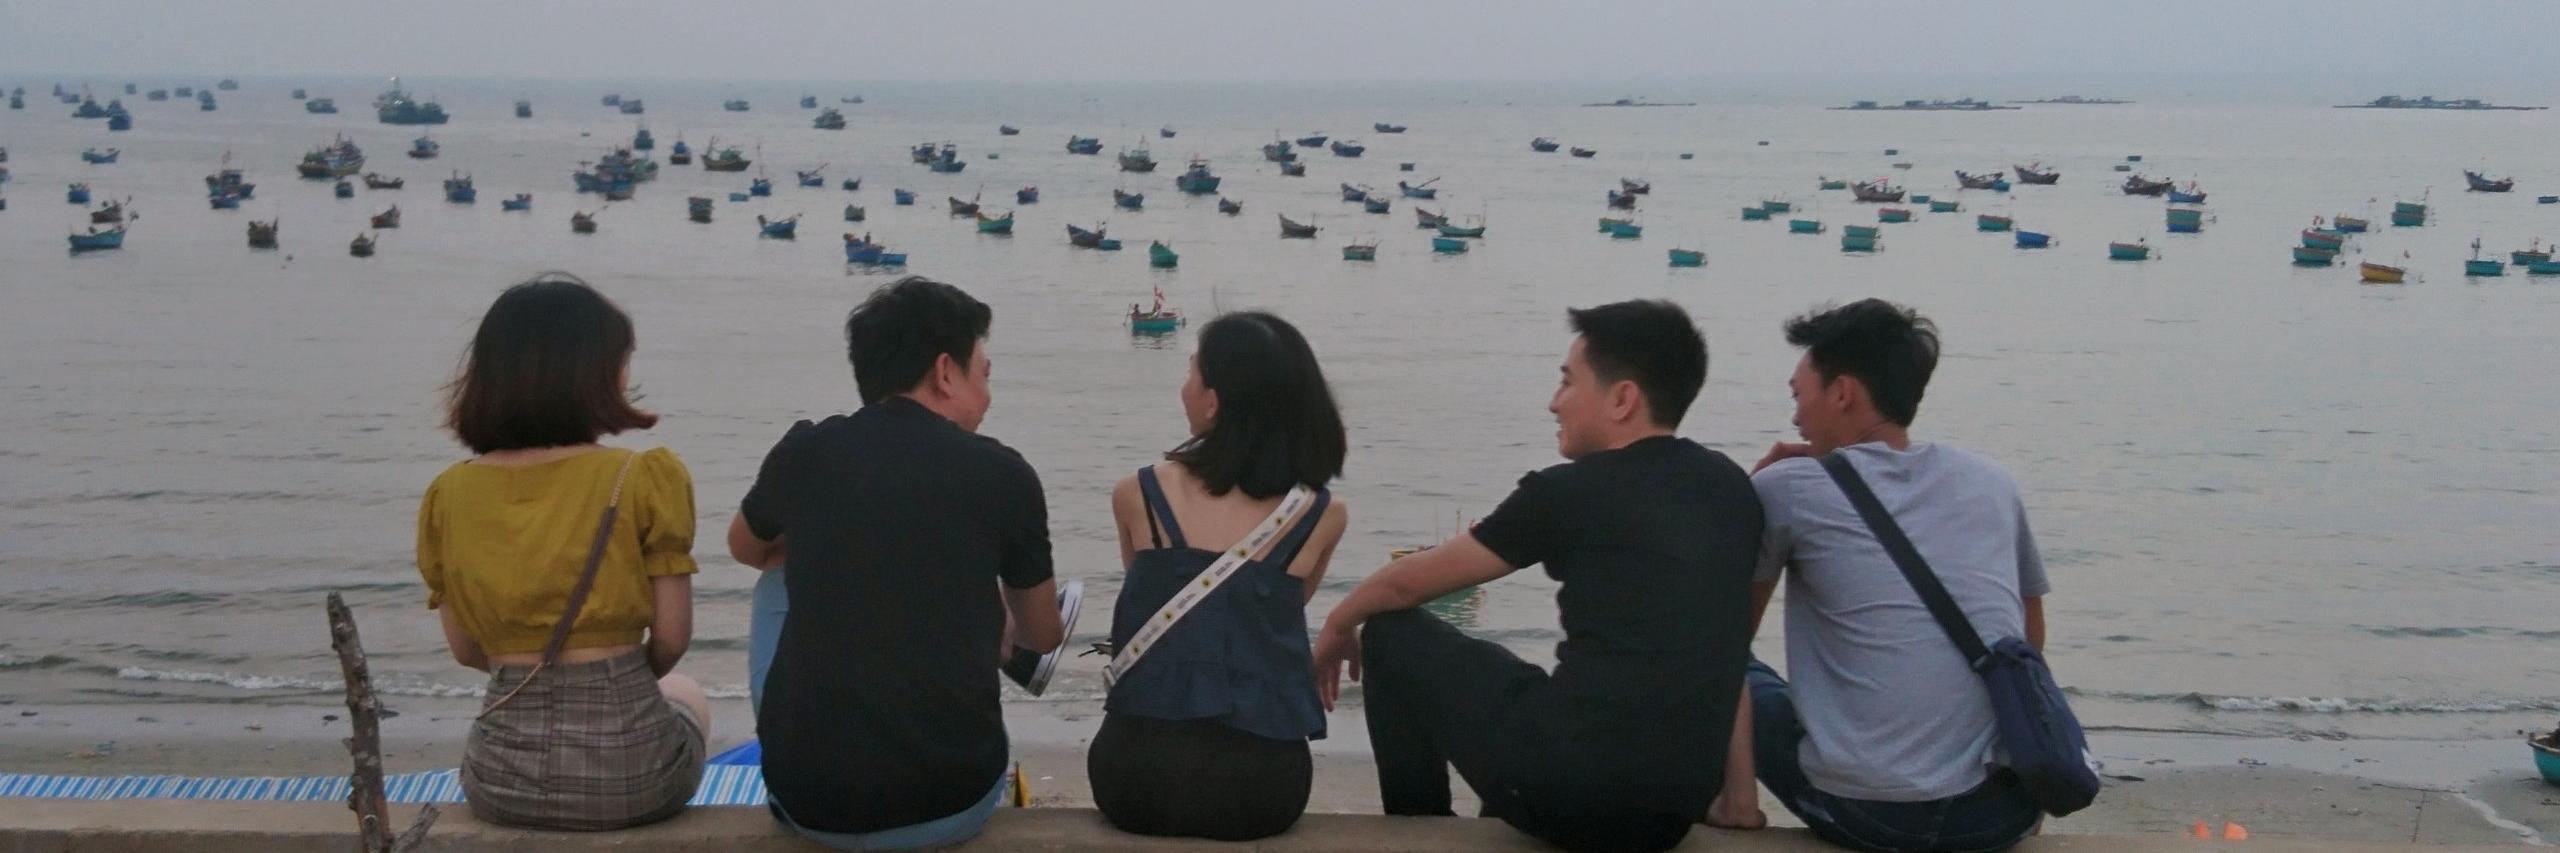 https://gody.vn/blog/nguyenthuy249956044/post/binh-thuan-2019-em-co-muon-ngay-nao-do-minh-ra-khoi-5786